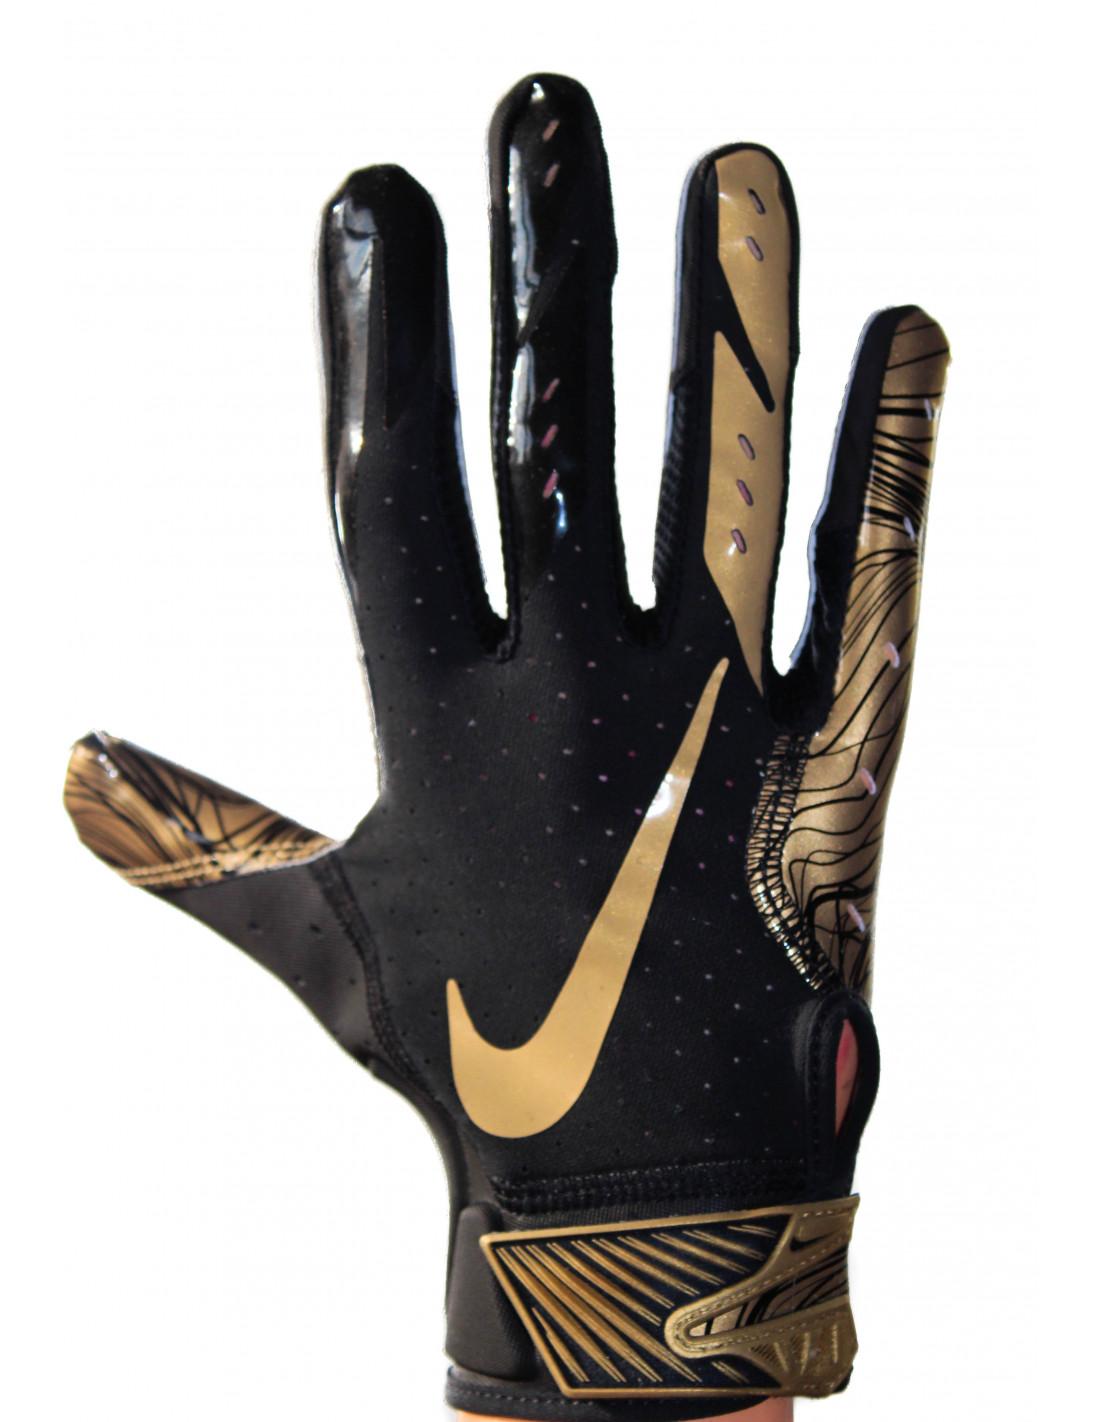 e5a118983e58 Nike Vapor Jet 5 - Black-gold Football Gloves LIMITED EDITION